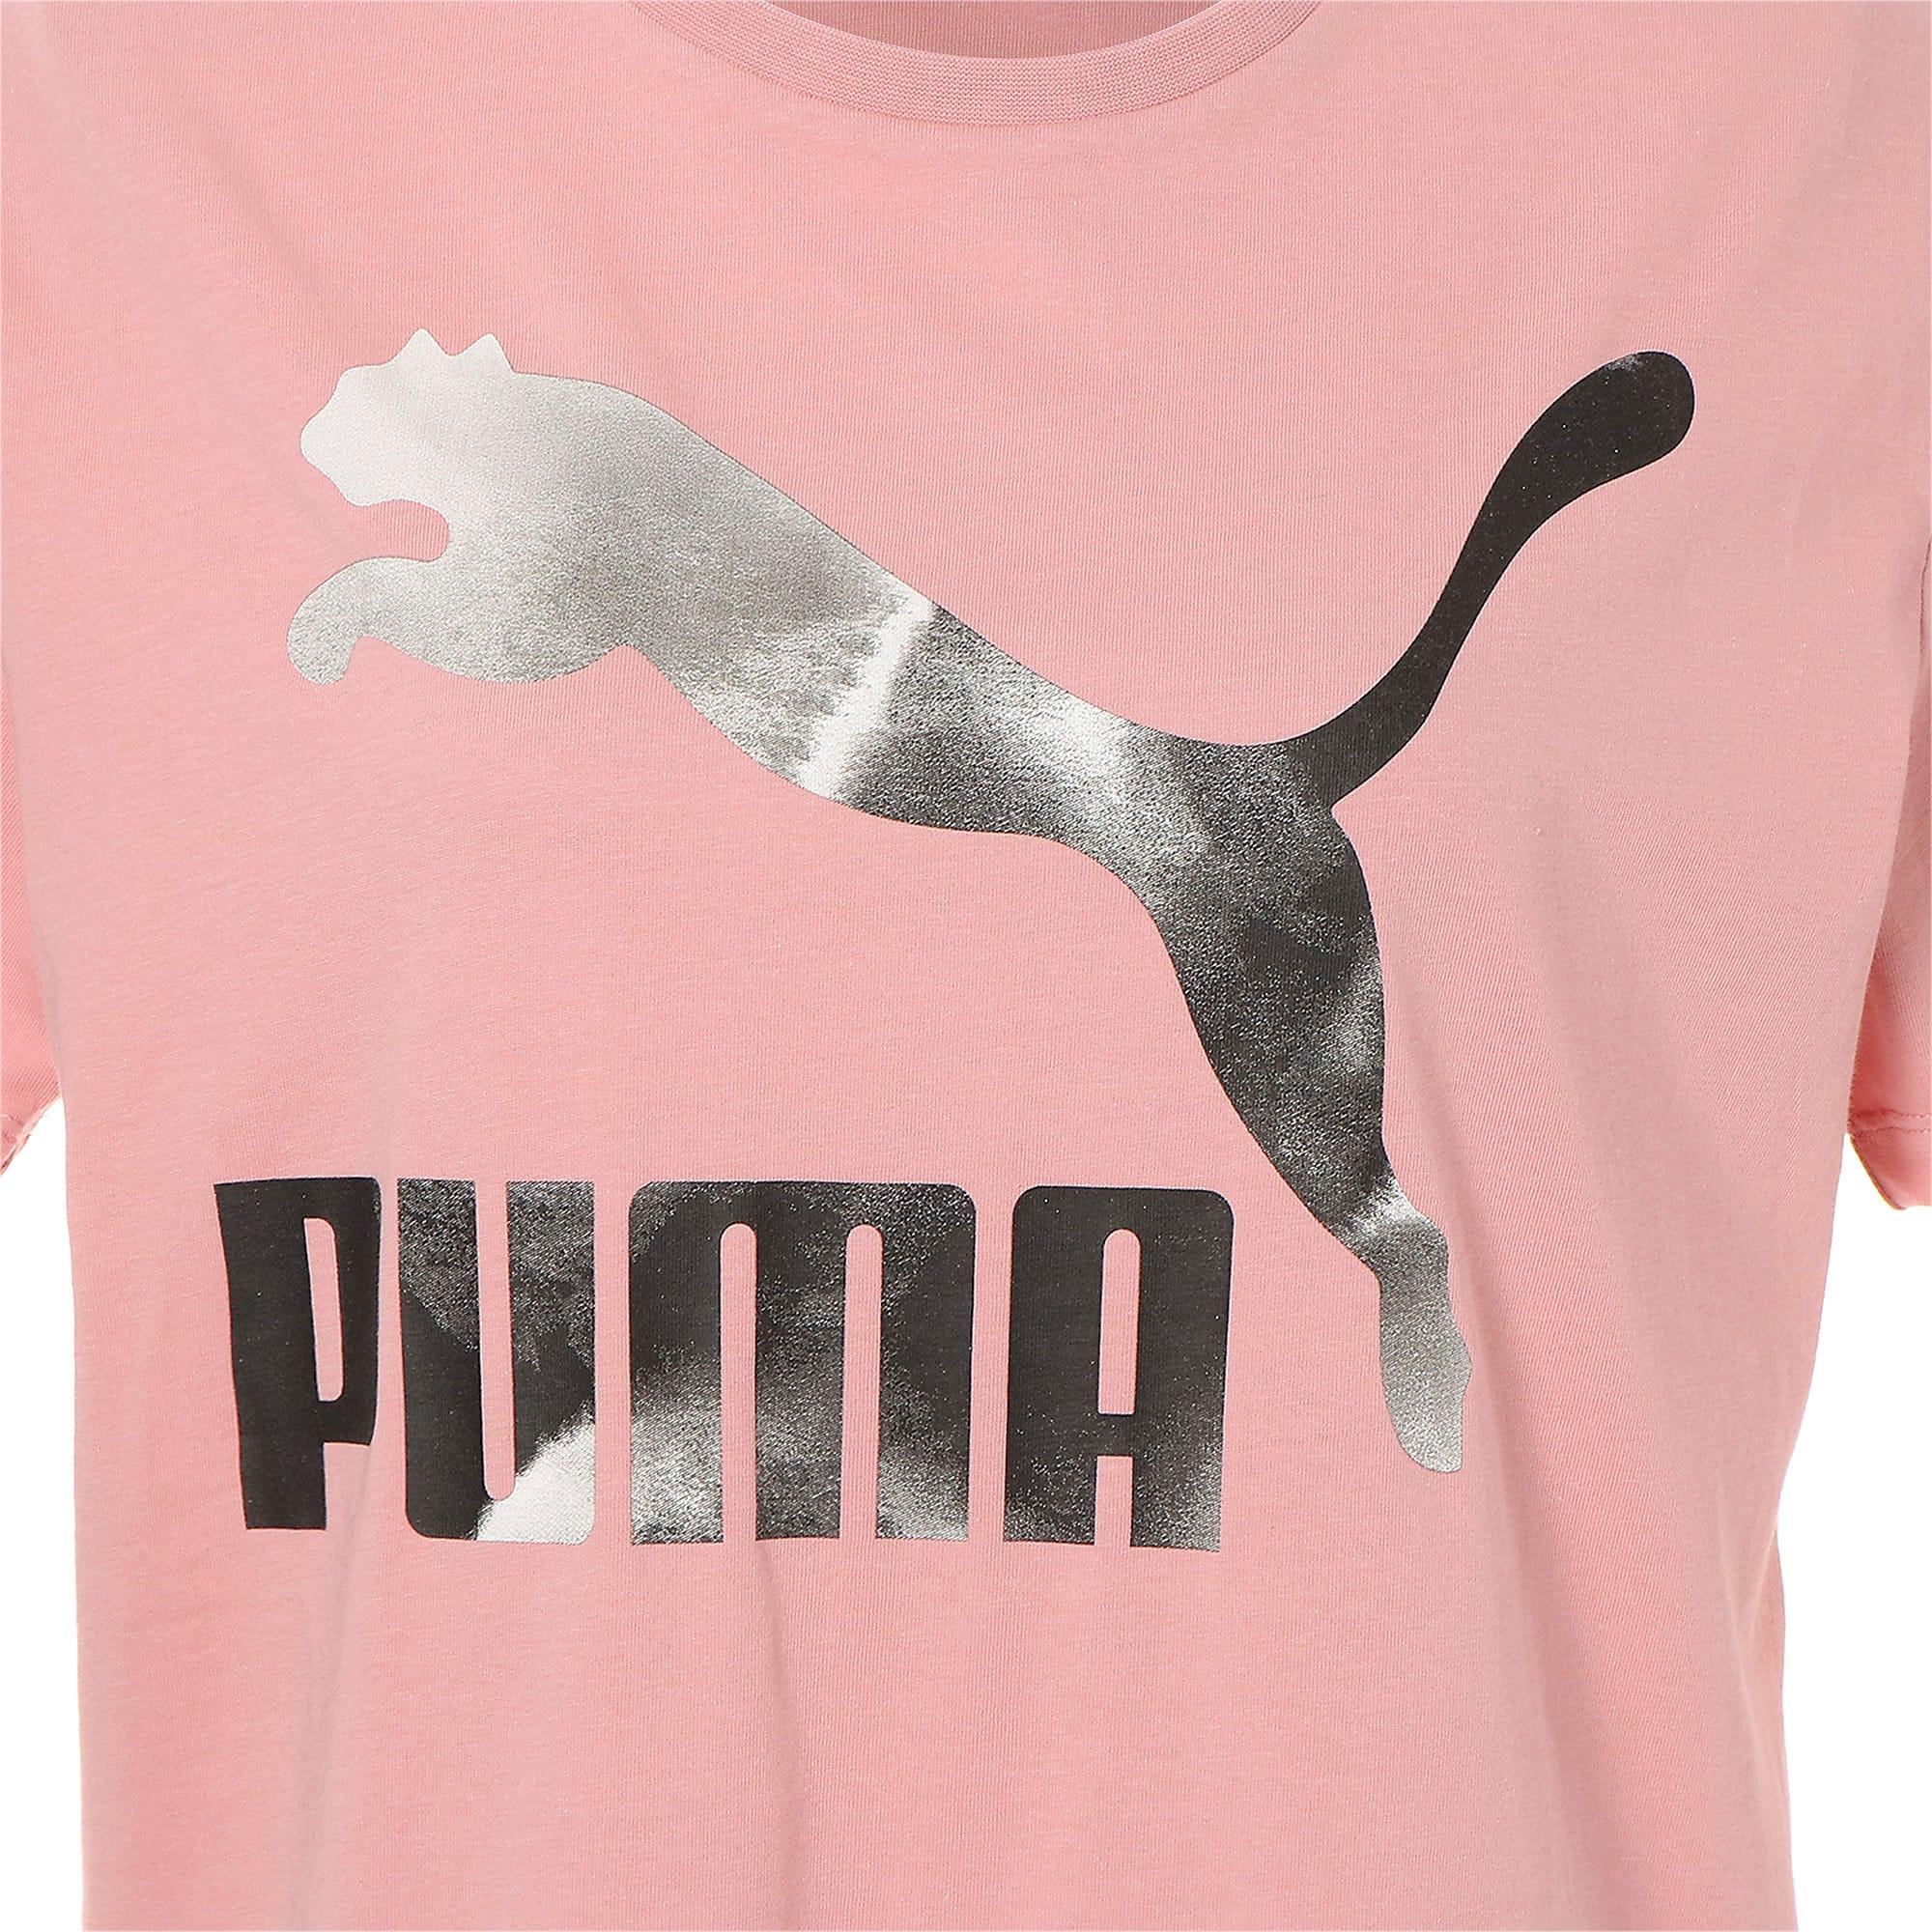 Thumbnail 4 of CLOUD パック ウィメンズ グラフィック Tシャツ, Bridal Rose, medium-JPN